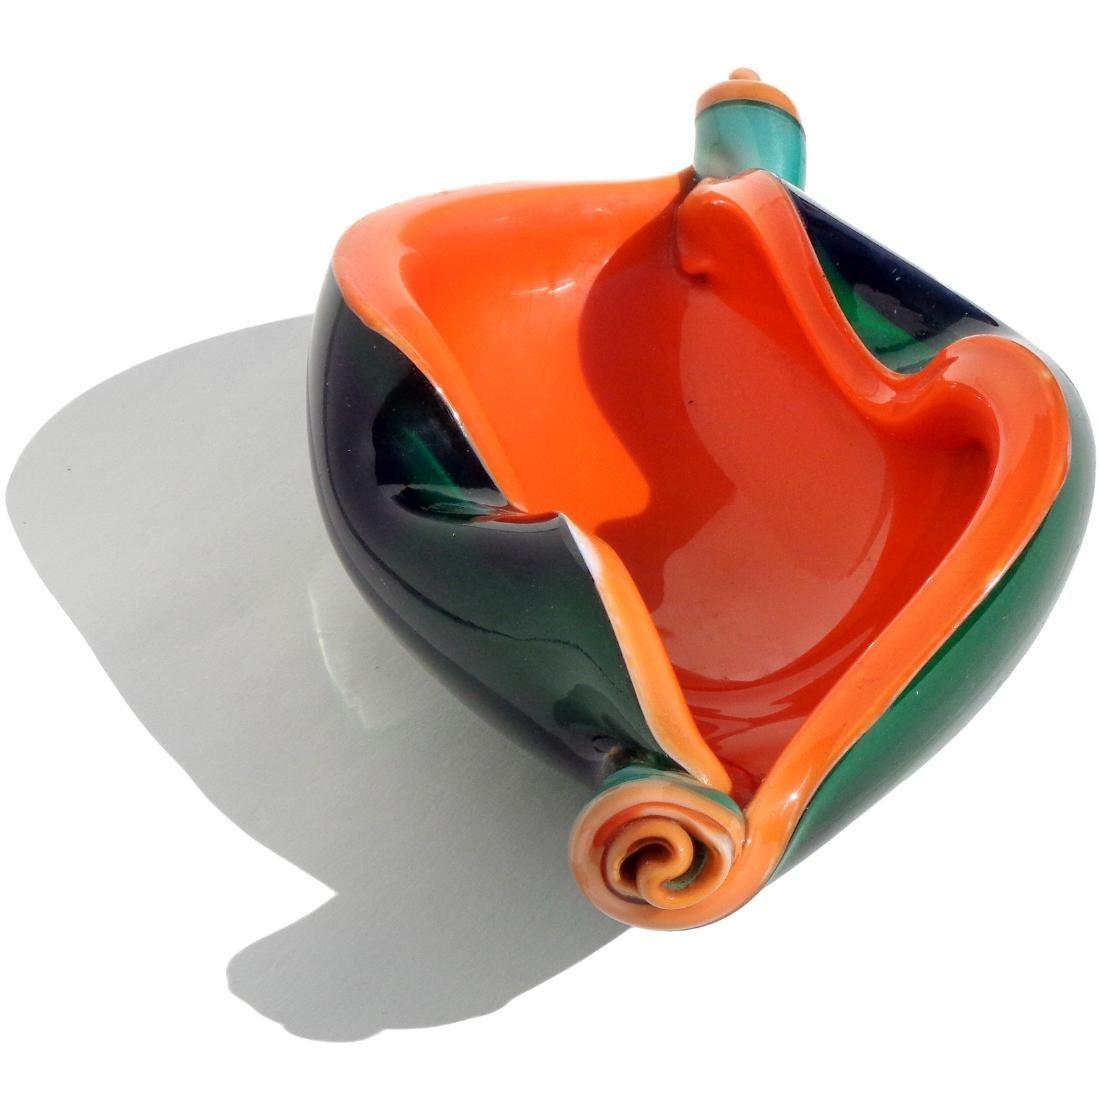 Fratelli Toso Green & Orange Art Glass Scroll Bowl - 2